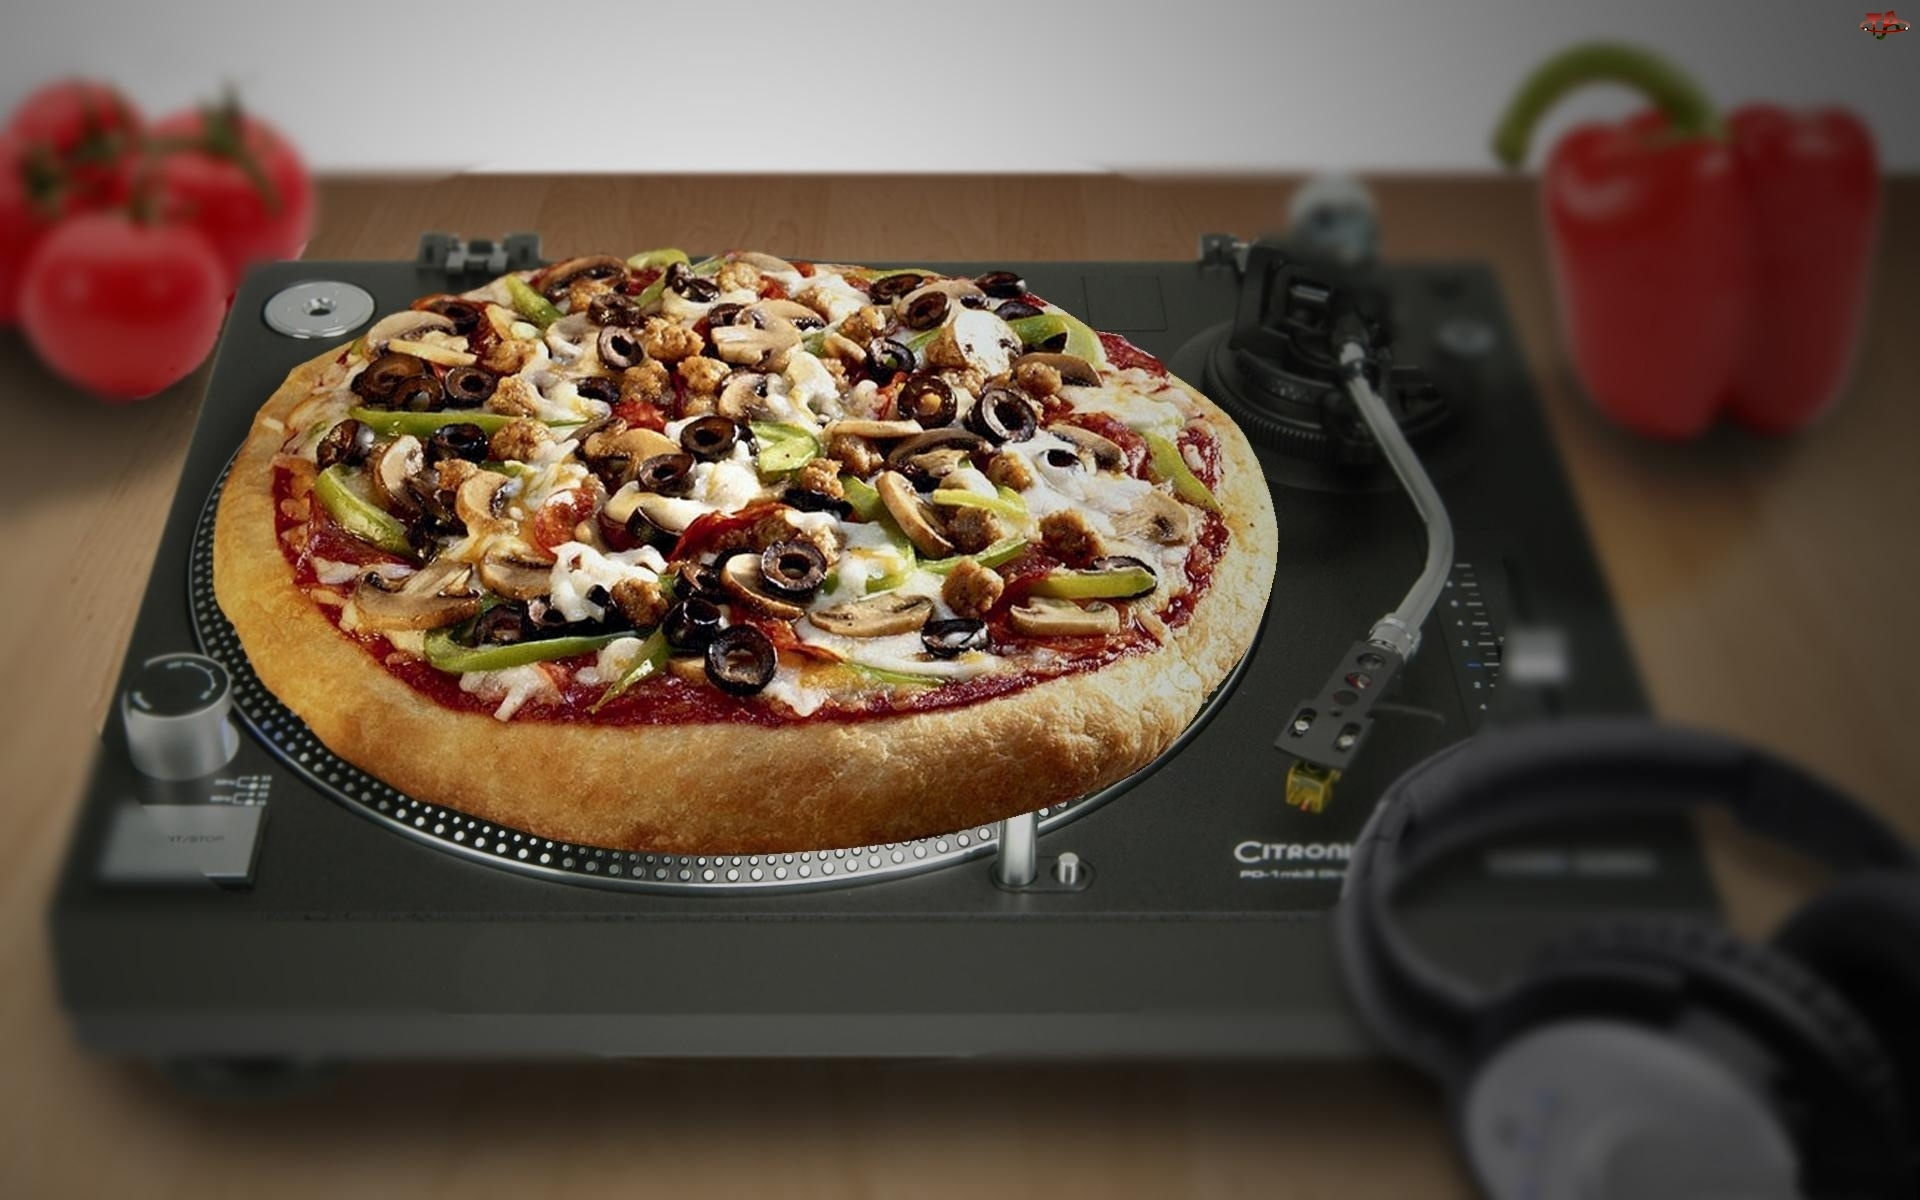 Pizza, Papryka, Gramofon, Pomidory